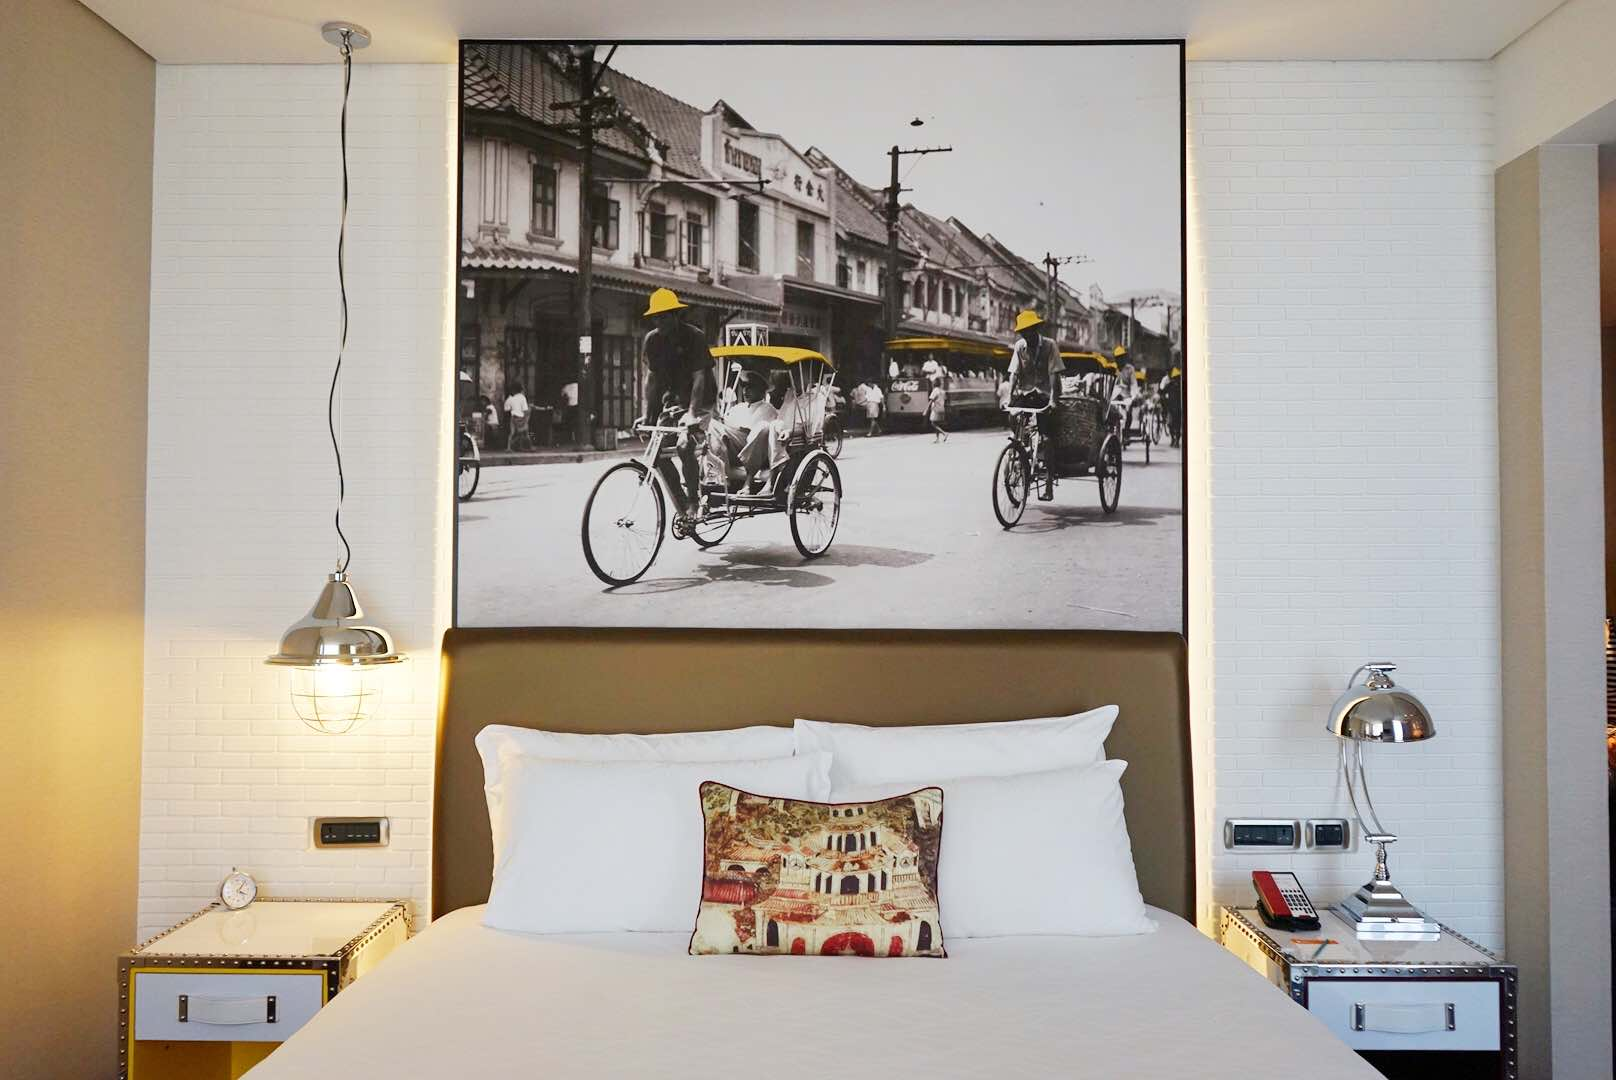 Comfortable Beds At Hotel Indigo Bangkok - AspirantSG